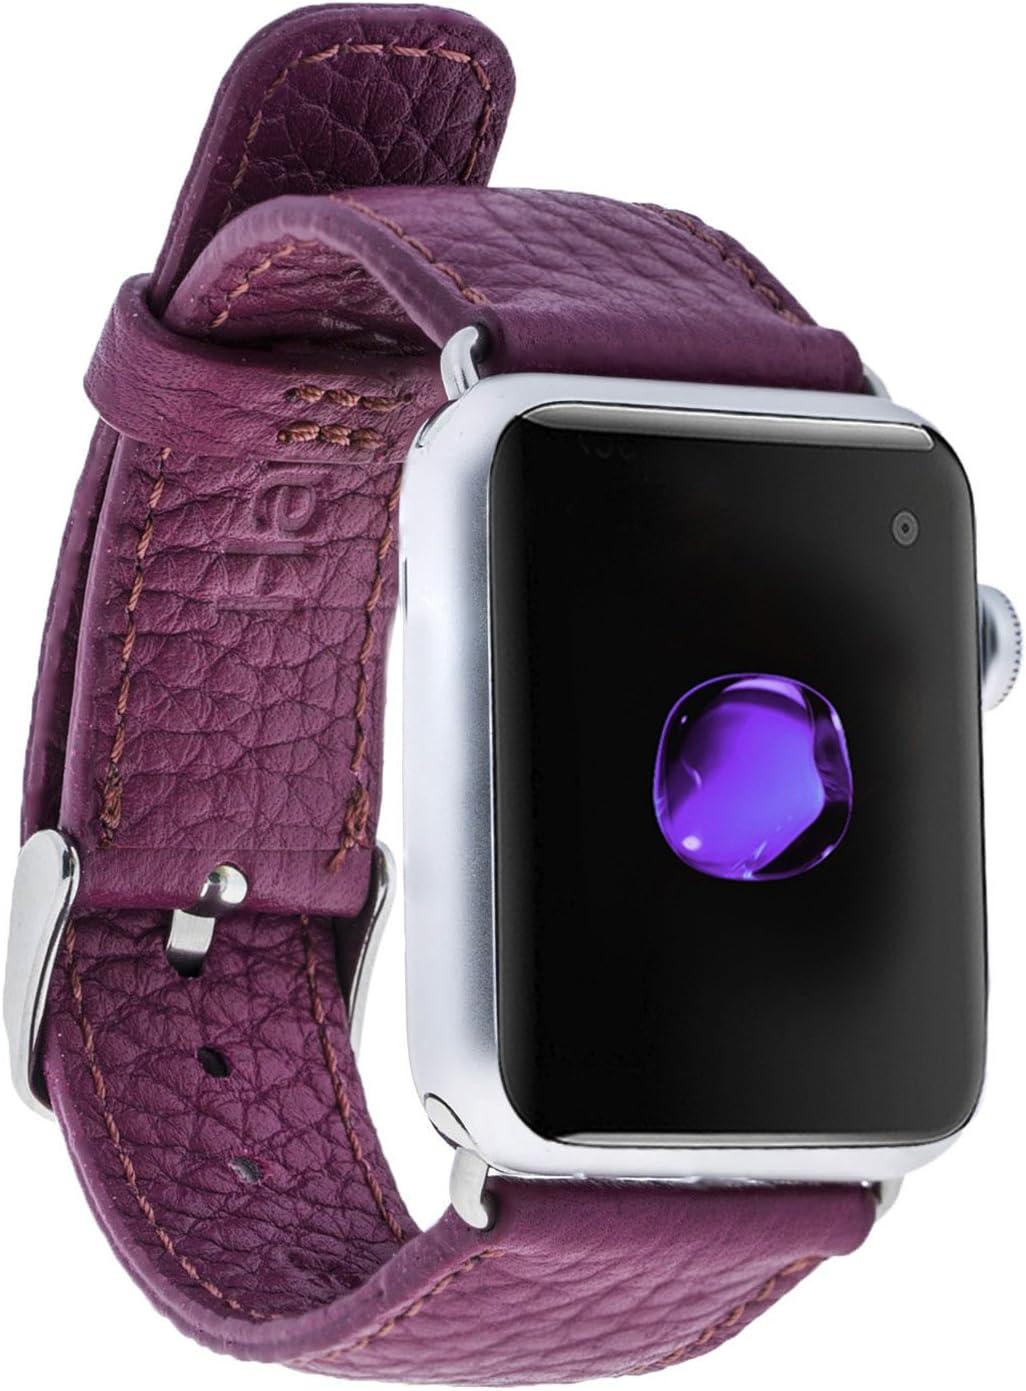 Hardiston | for Apple Watch Series 5-4 (40 mm) / 3-2-1 (38 mm) | Genuine Leather Handmade Rainbow Watch Band for Men/Women | (Floater Fuchsia/Silver)